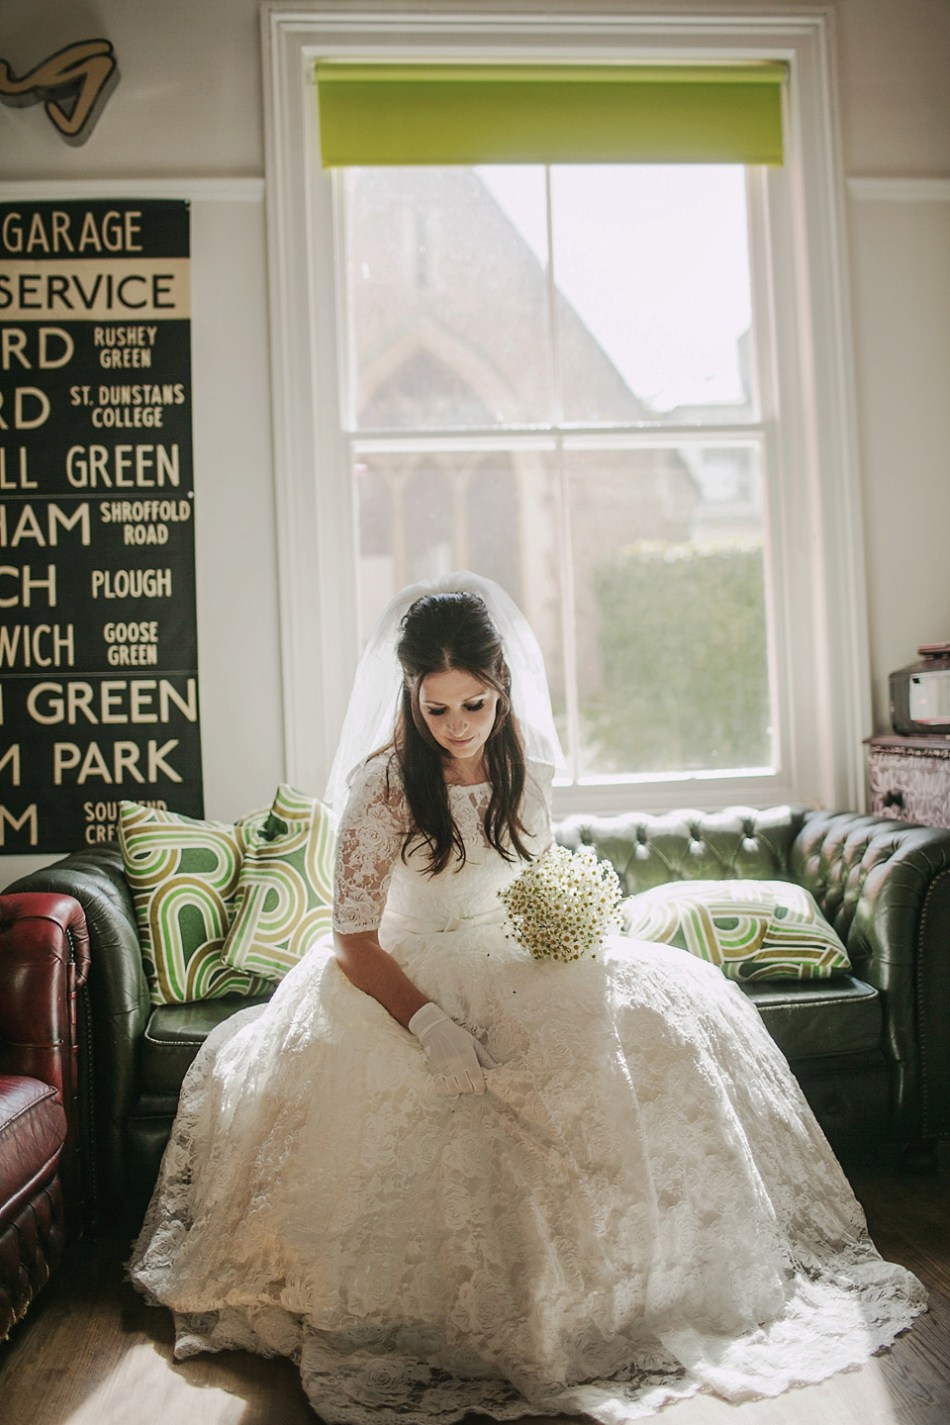 The Fabulous Vintage Bride Fantastic Retro Wedding Prop Hire Amp Styling